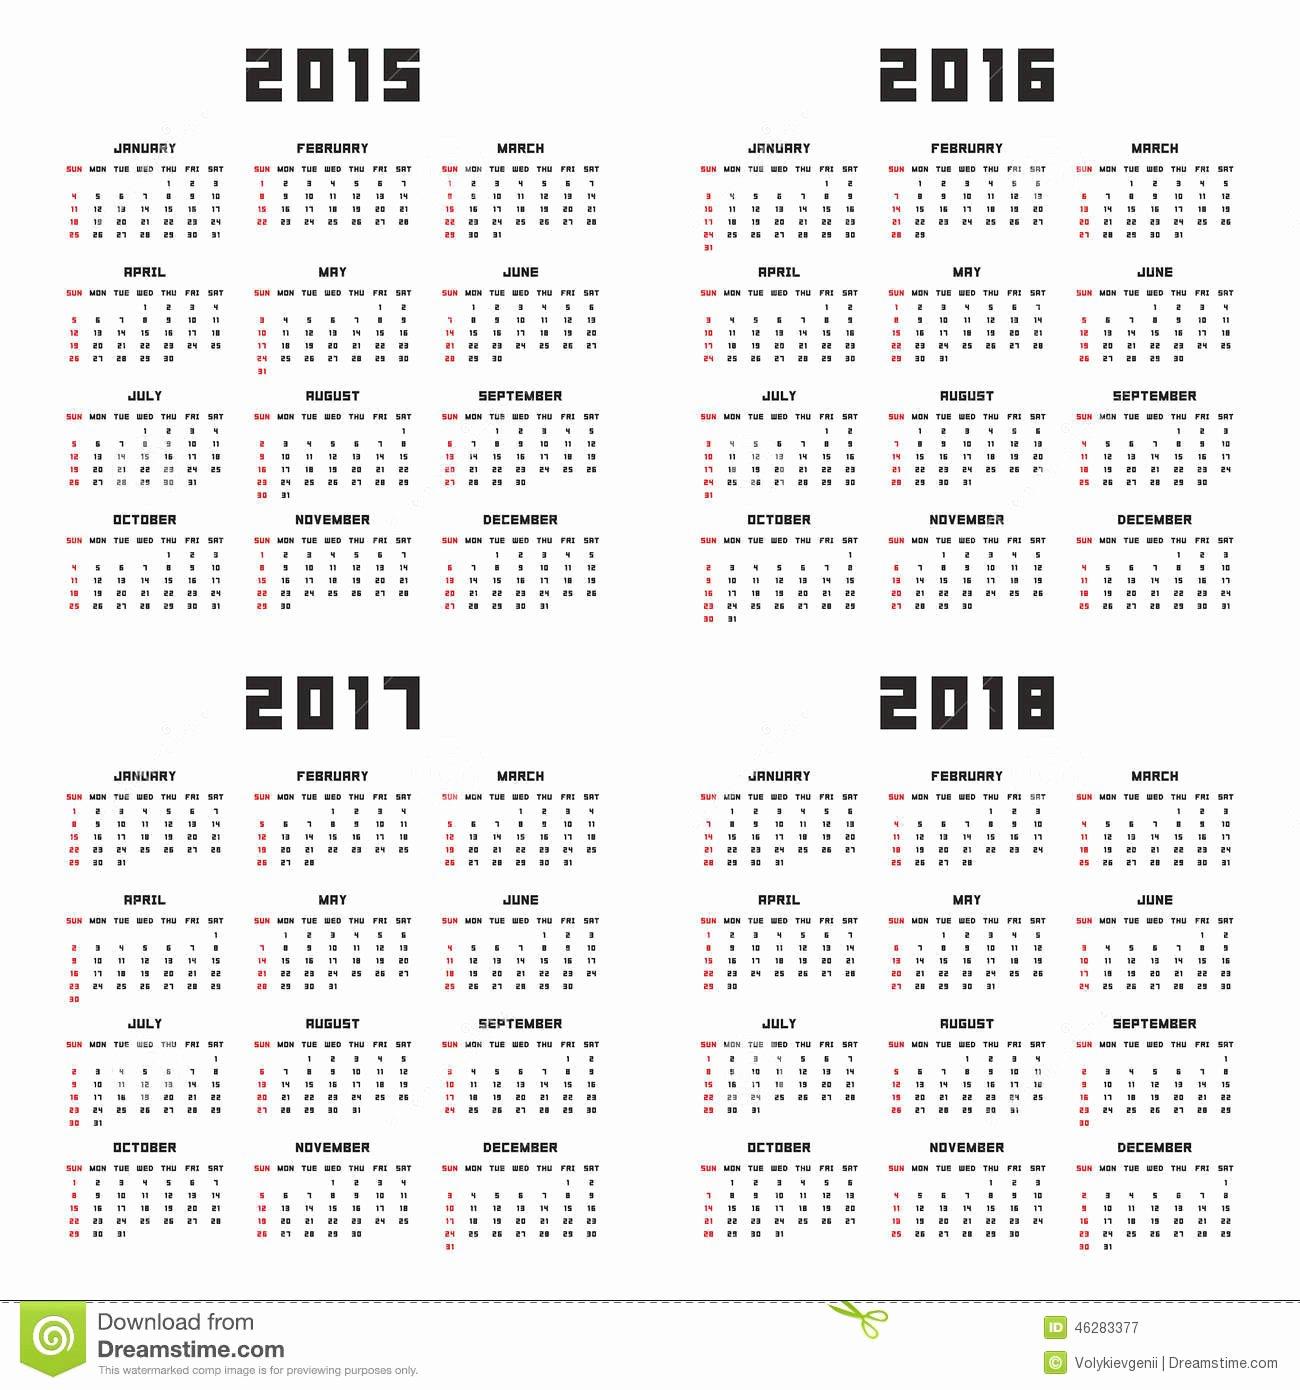 2018 Pocket Calendar Printable